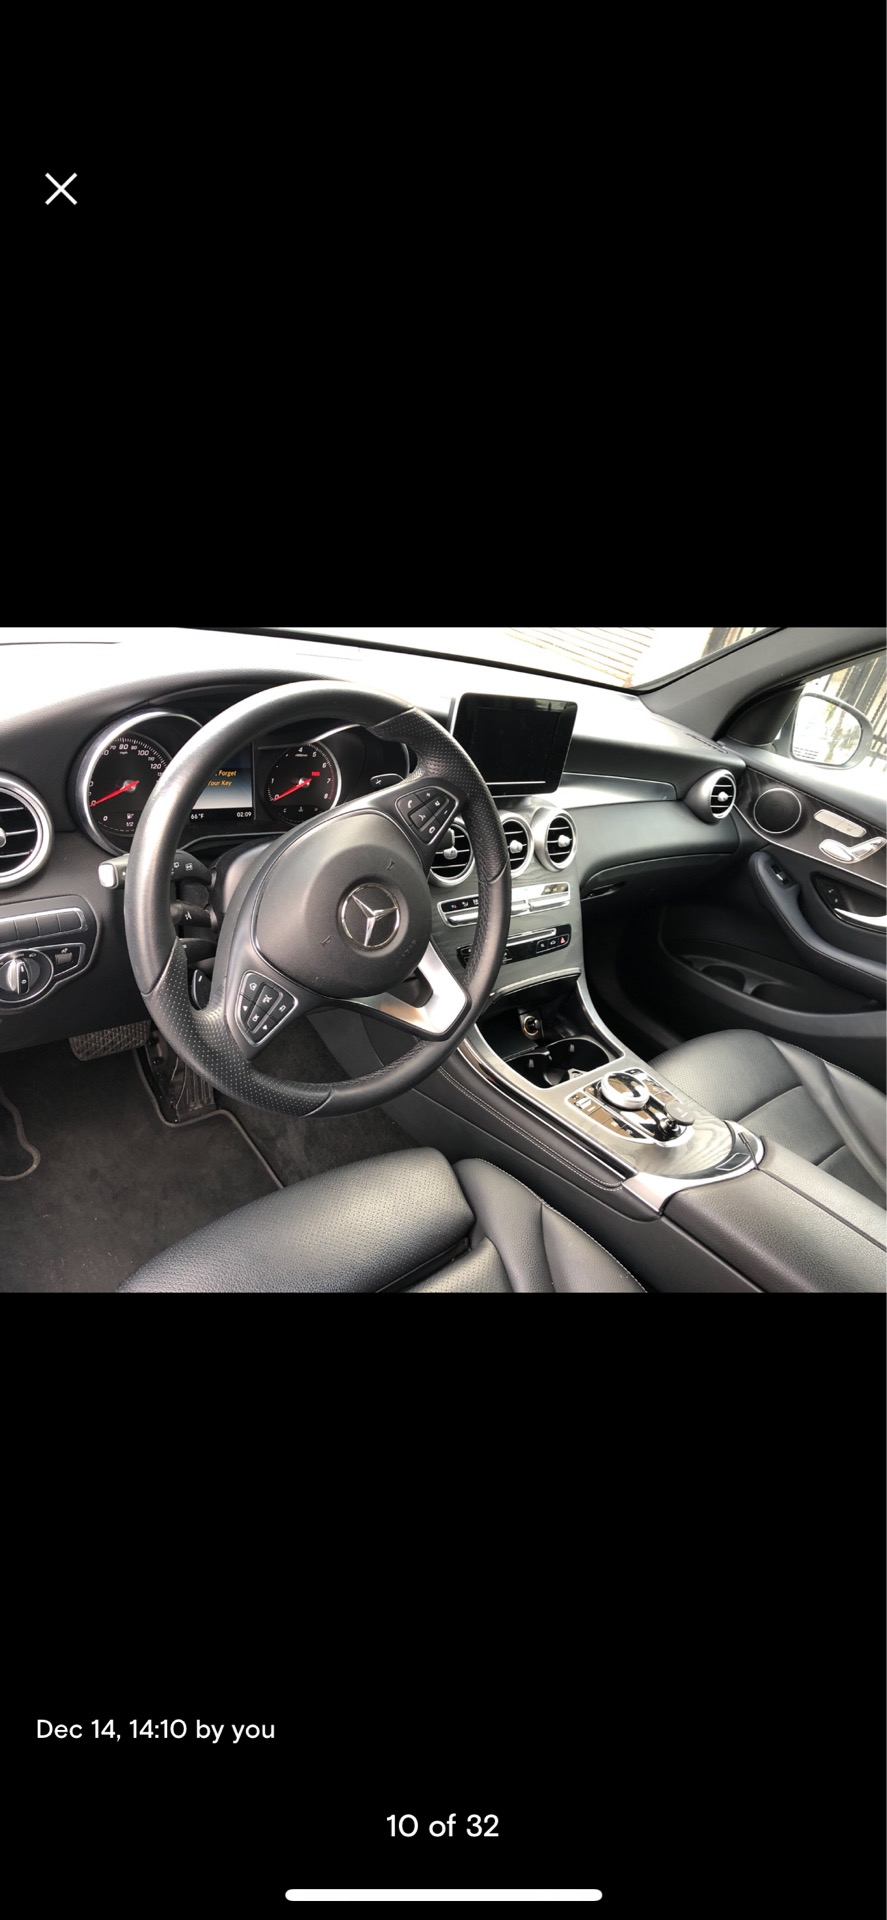 2018 Mercedes-Benz GLC - photo 2